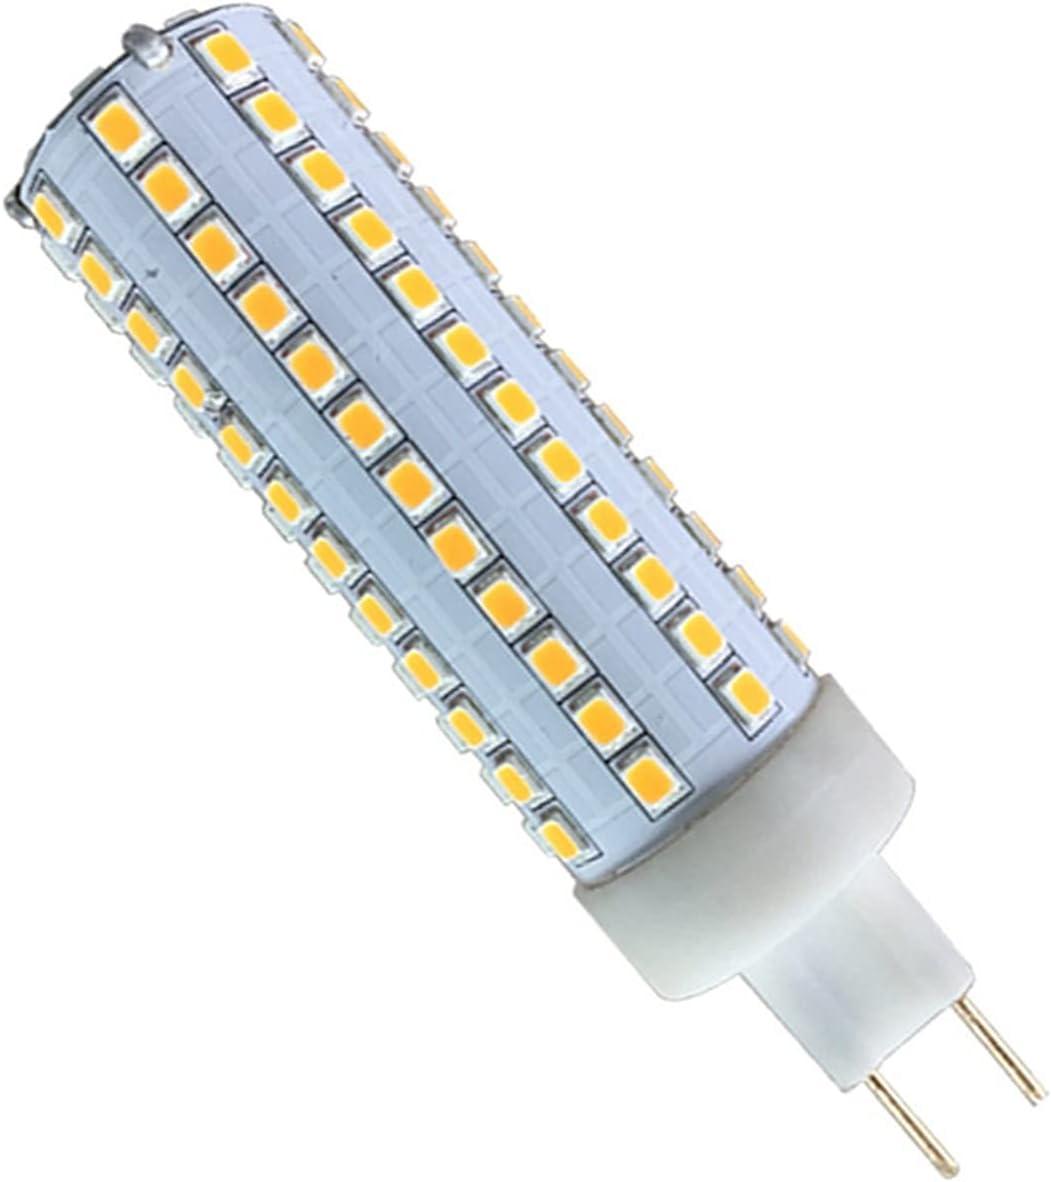 corn light 10Pcs Dimmable G8.5 Brand new LED Finally popular brand SMD 15W 20W Bulb 2835 Cor